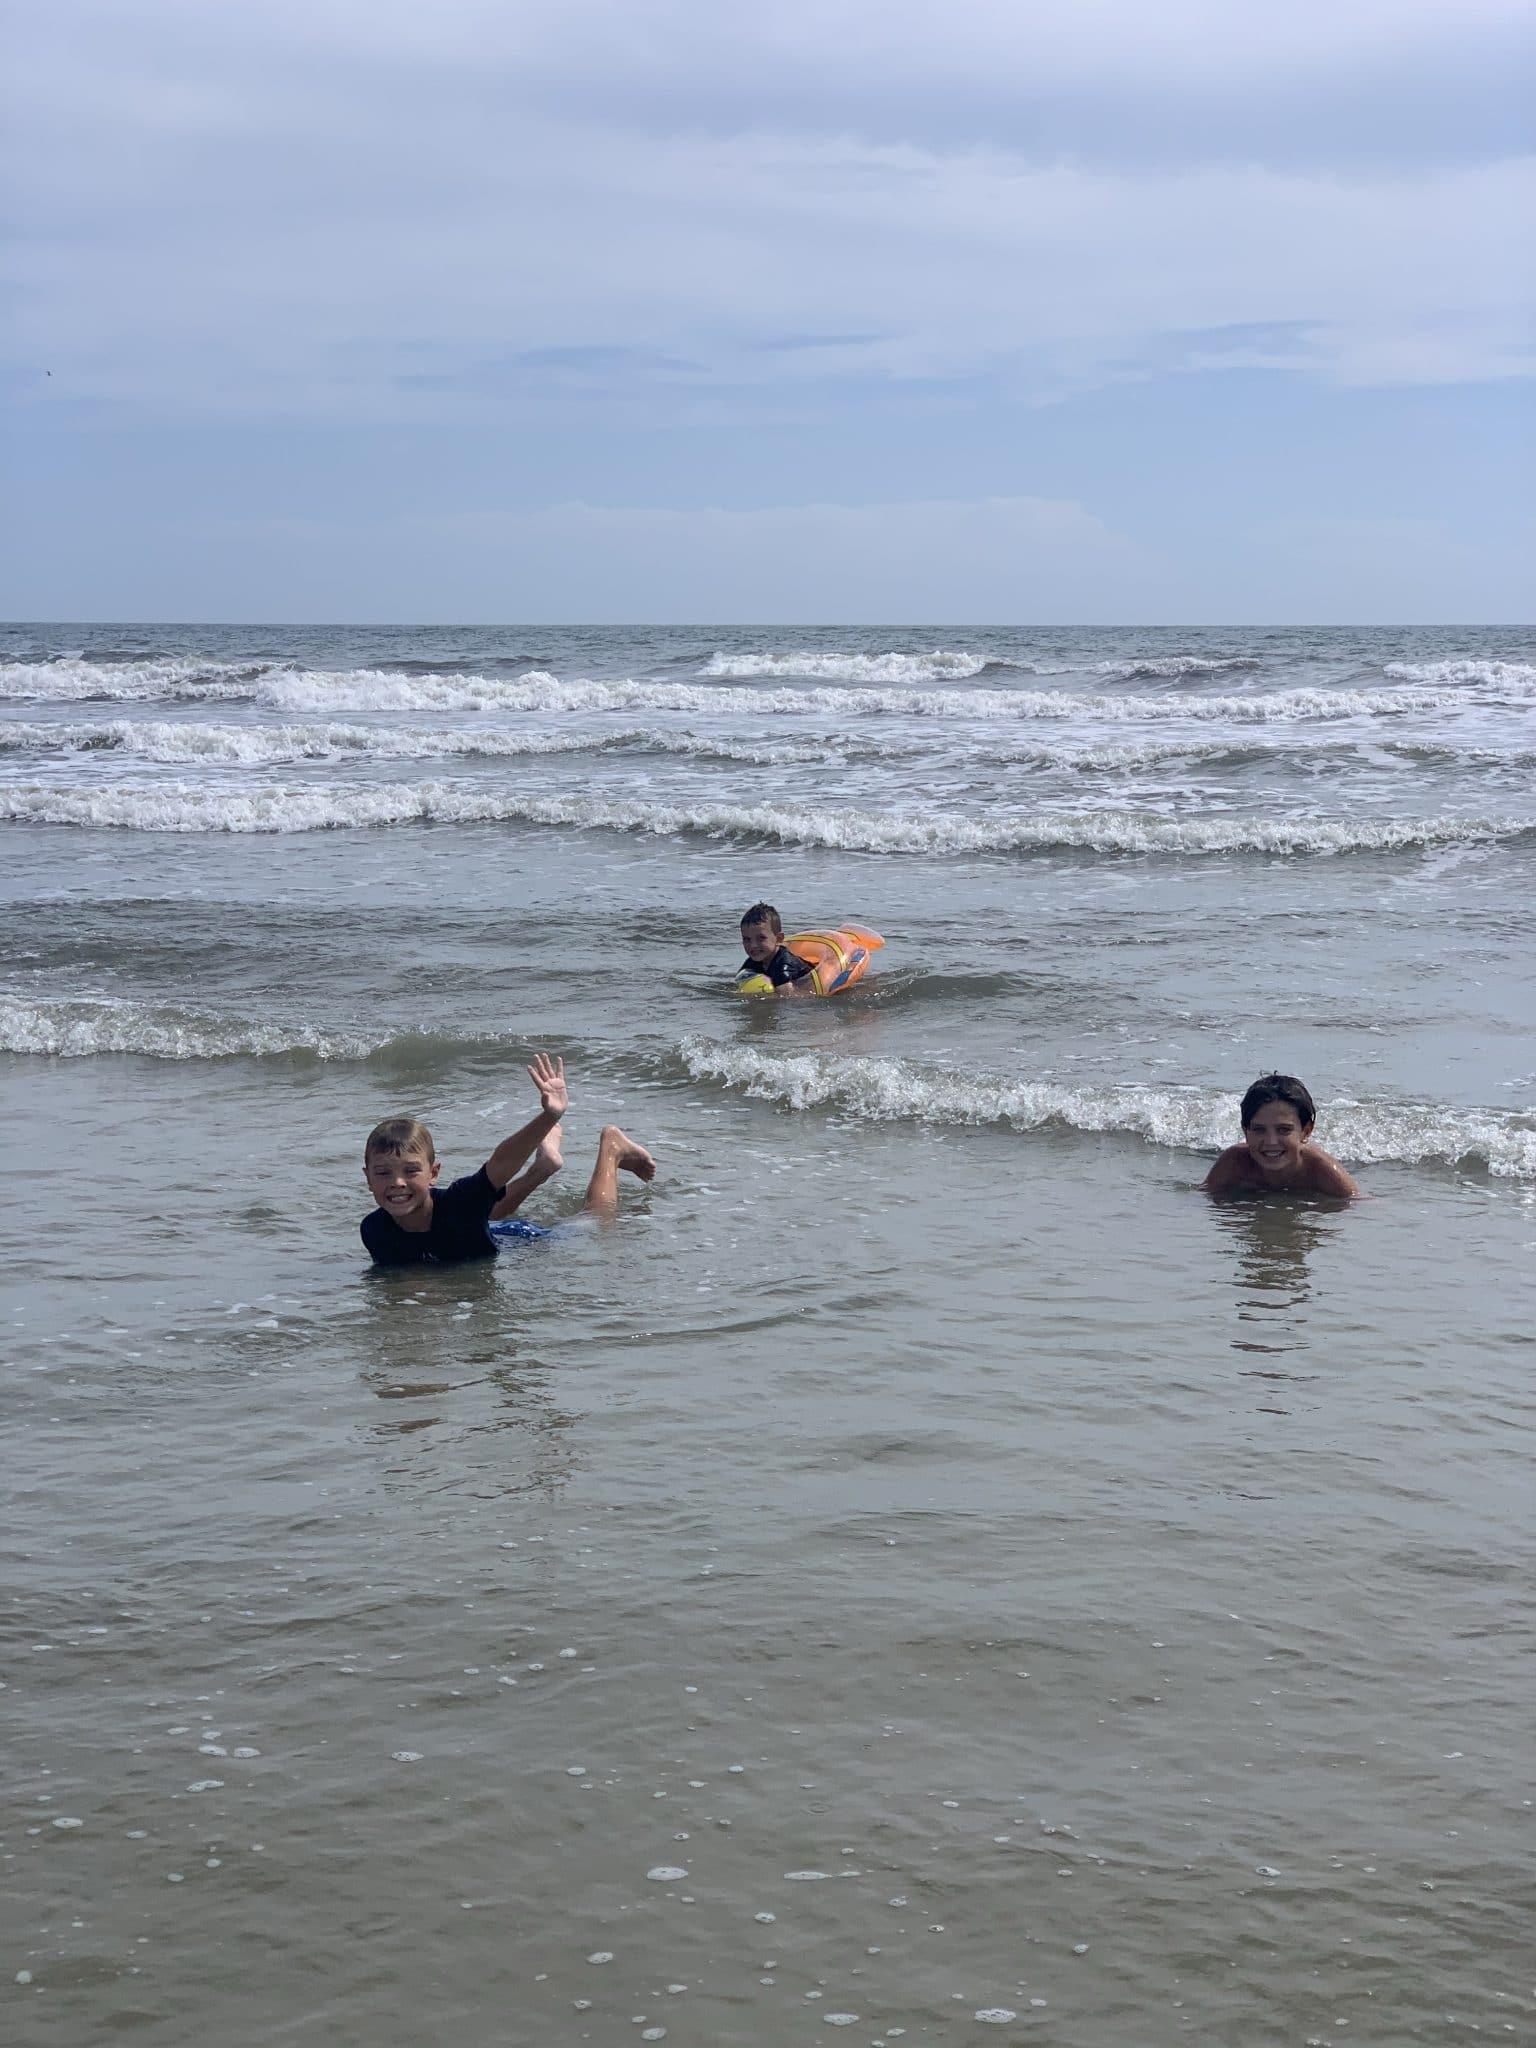 Hilton Head Island Beach, Best Family Vacation, Stilettos and Diapers